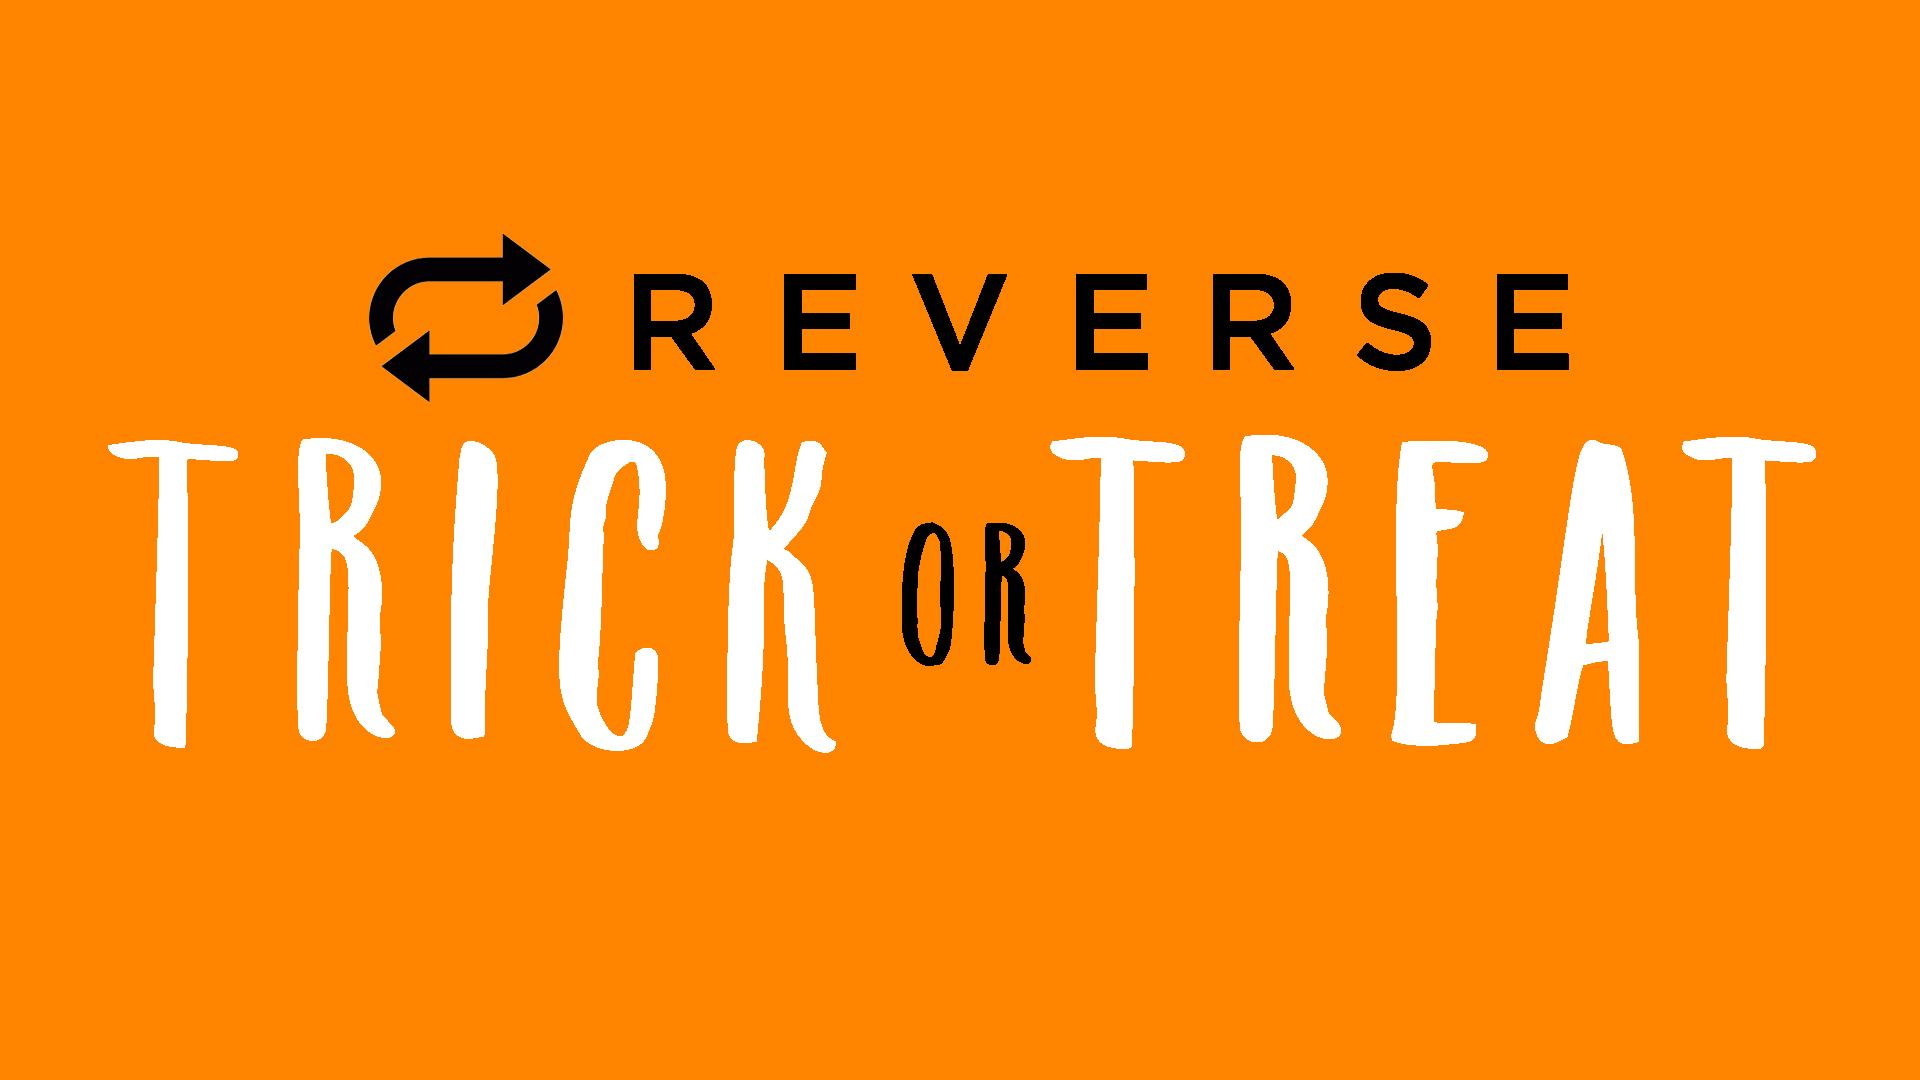 Reverse Trick or Treat .jpg